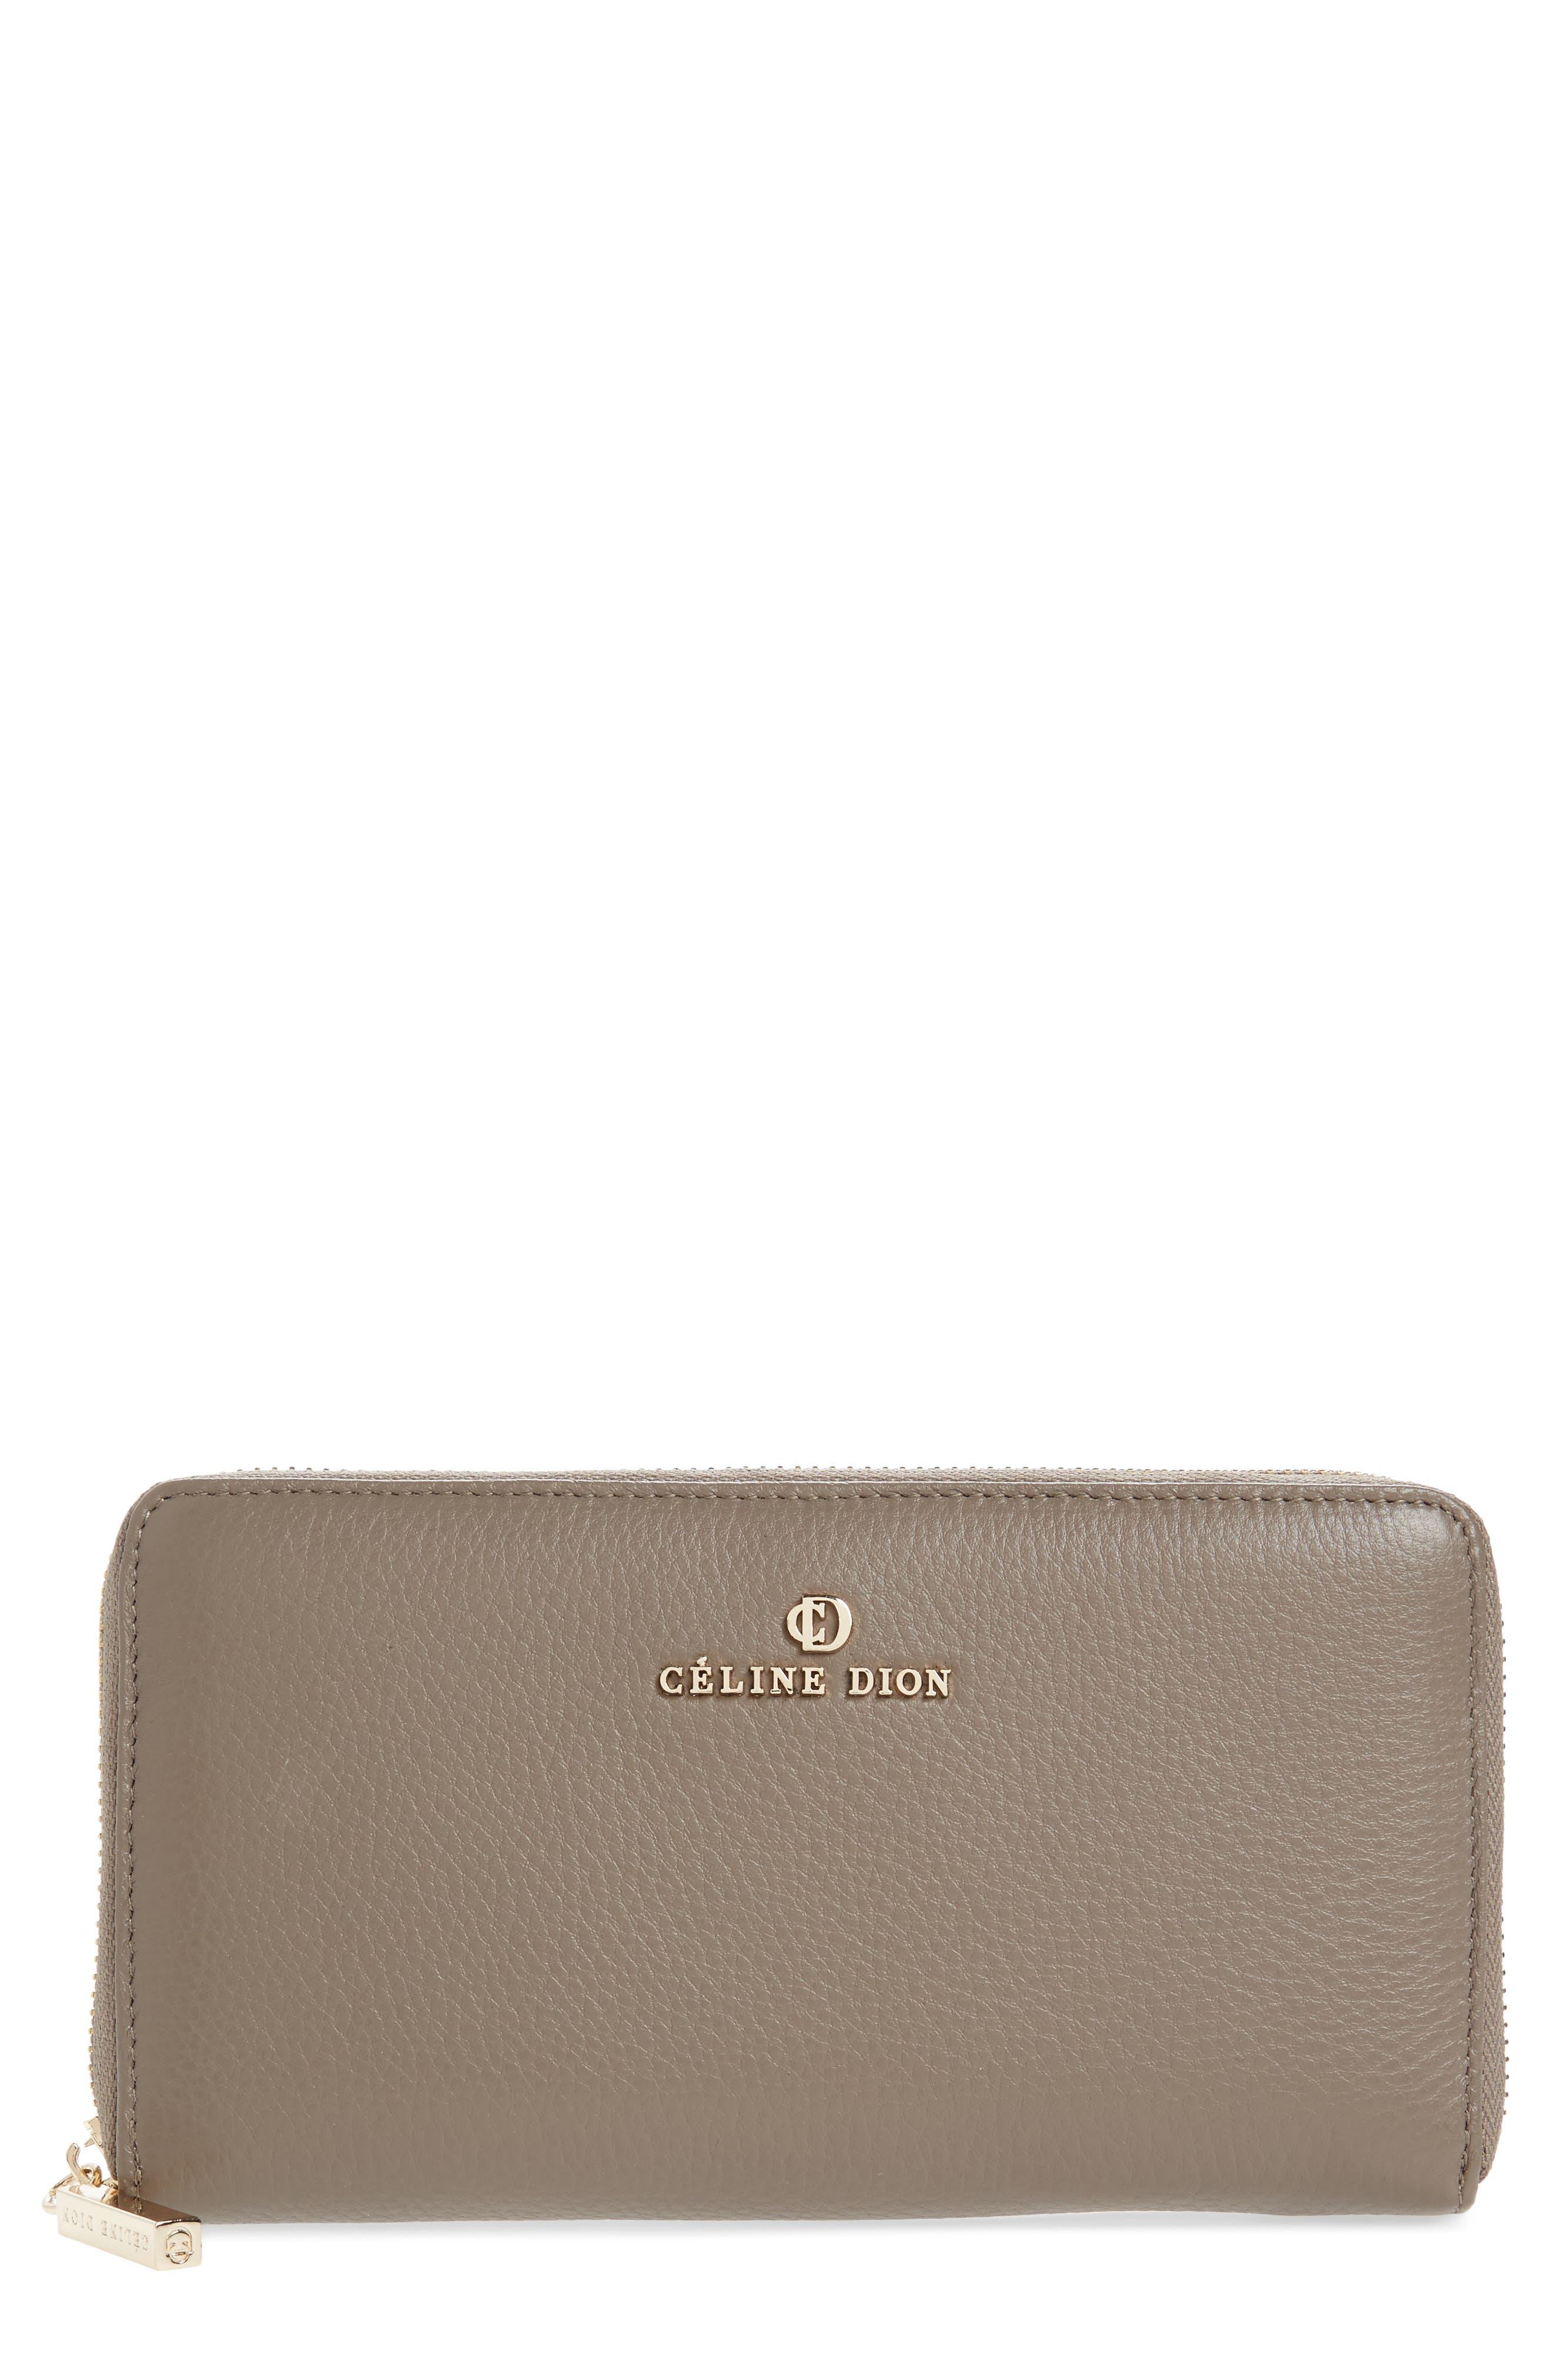 Céline Dion Adagio Leather Wallet